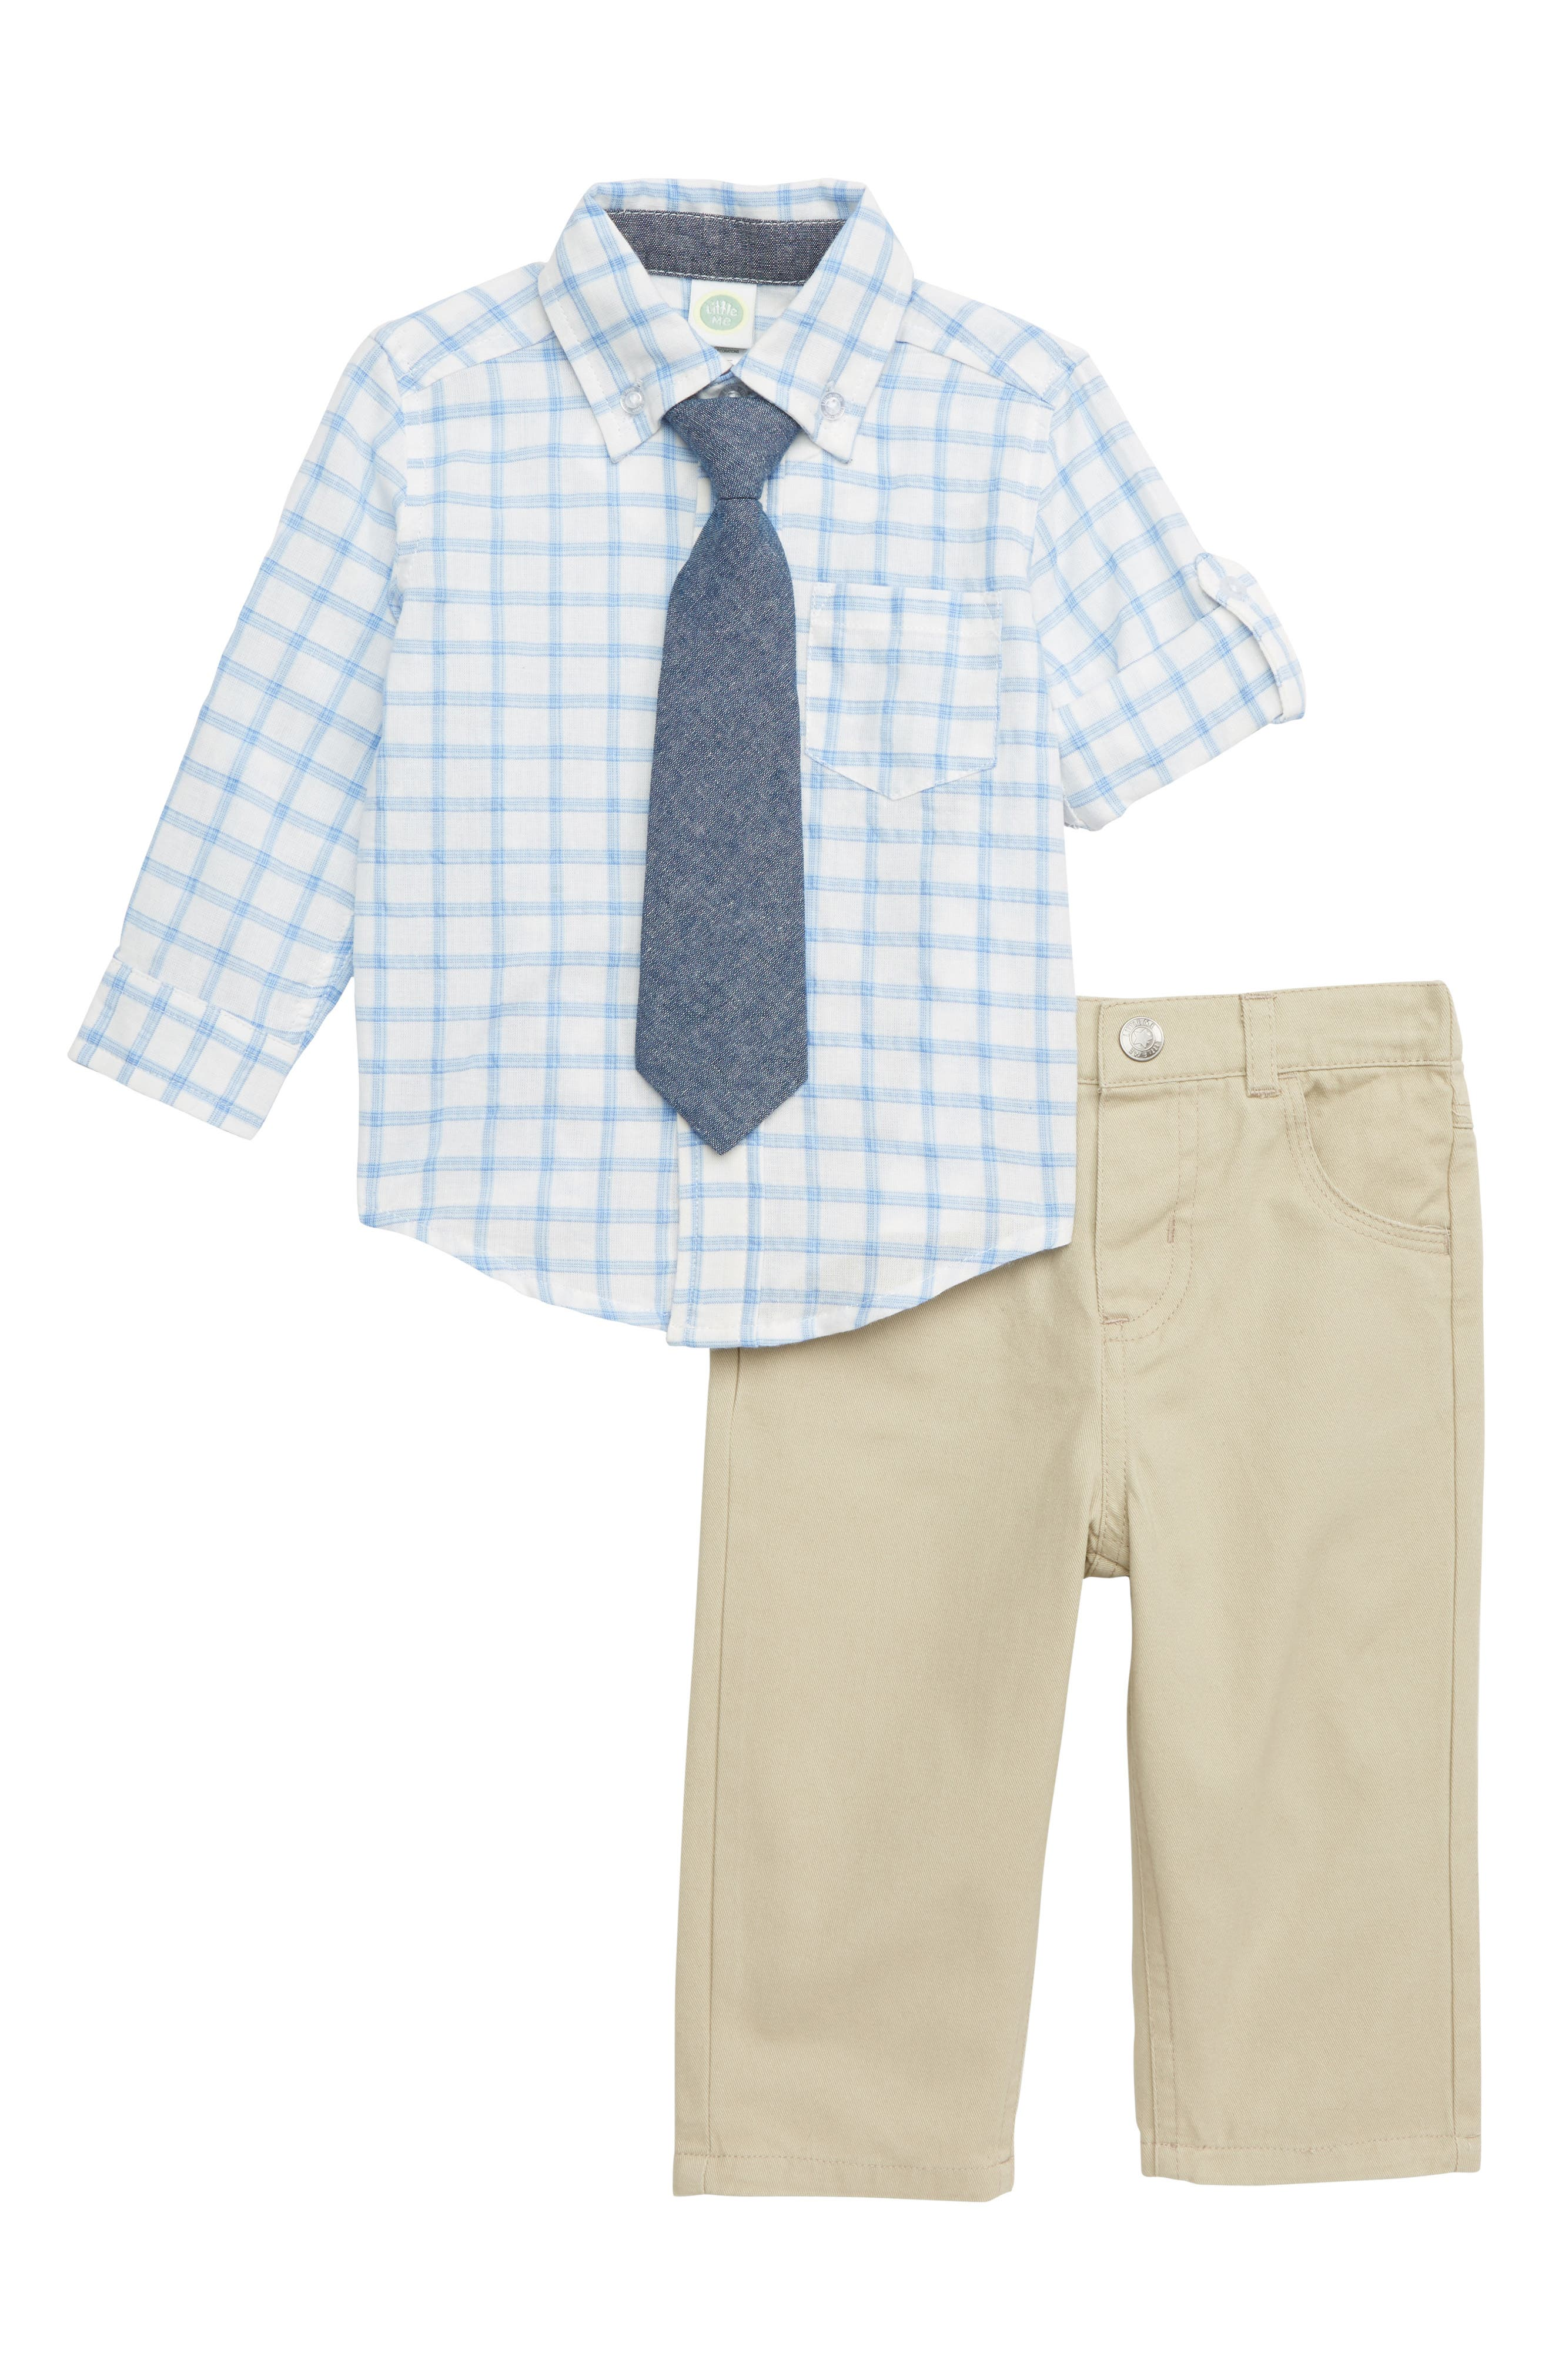 LITTLE ME, Tattersall Plaid Shirt, Pants & Tie Set, Main thumbnail 1, color, 250